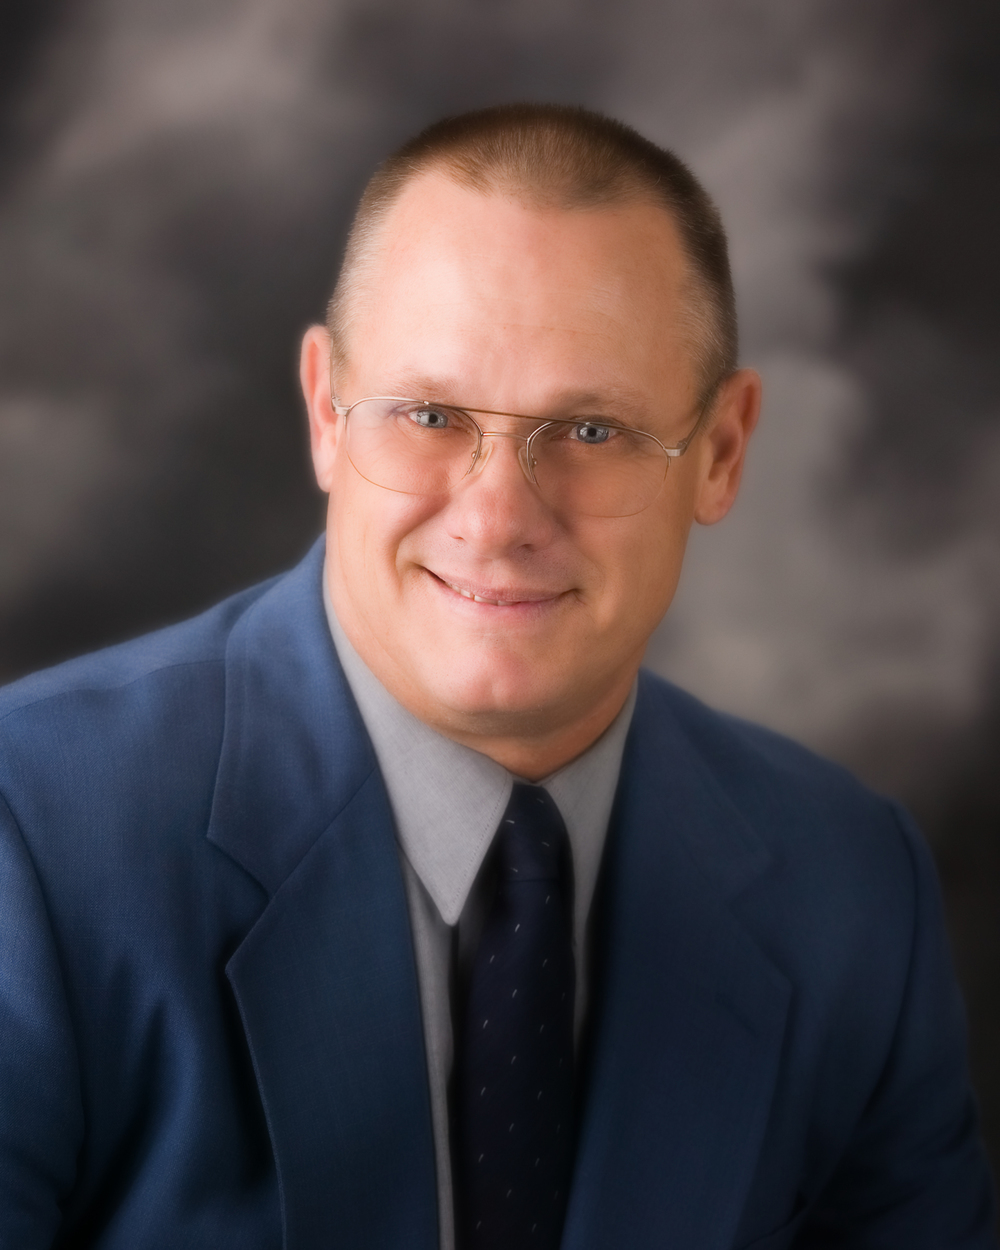 Bud Roberts